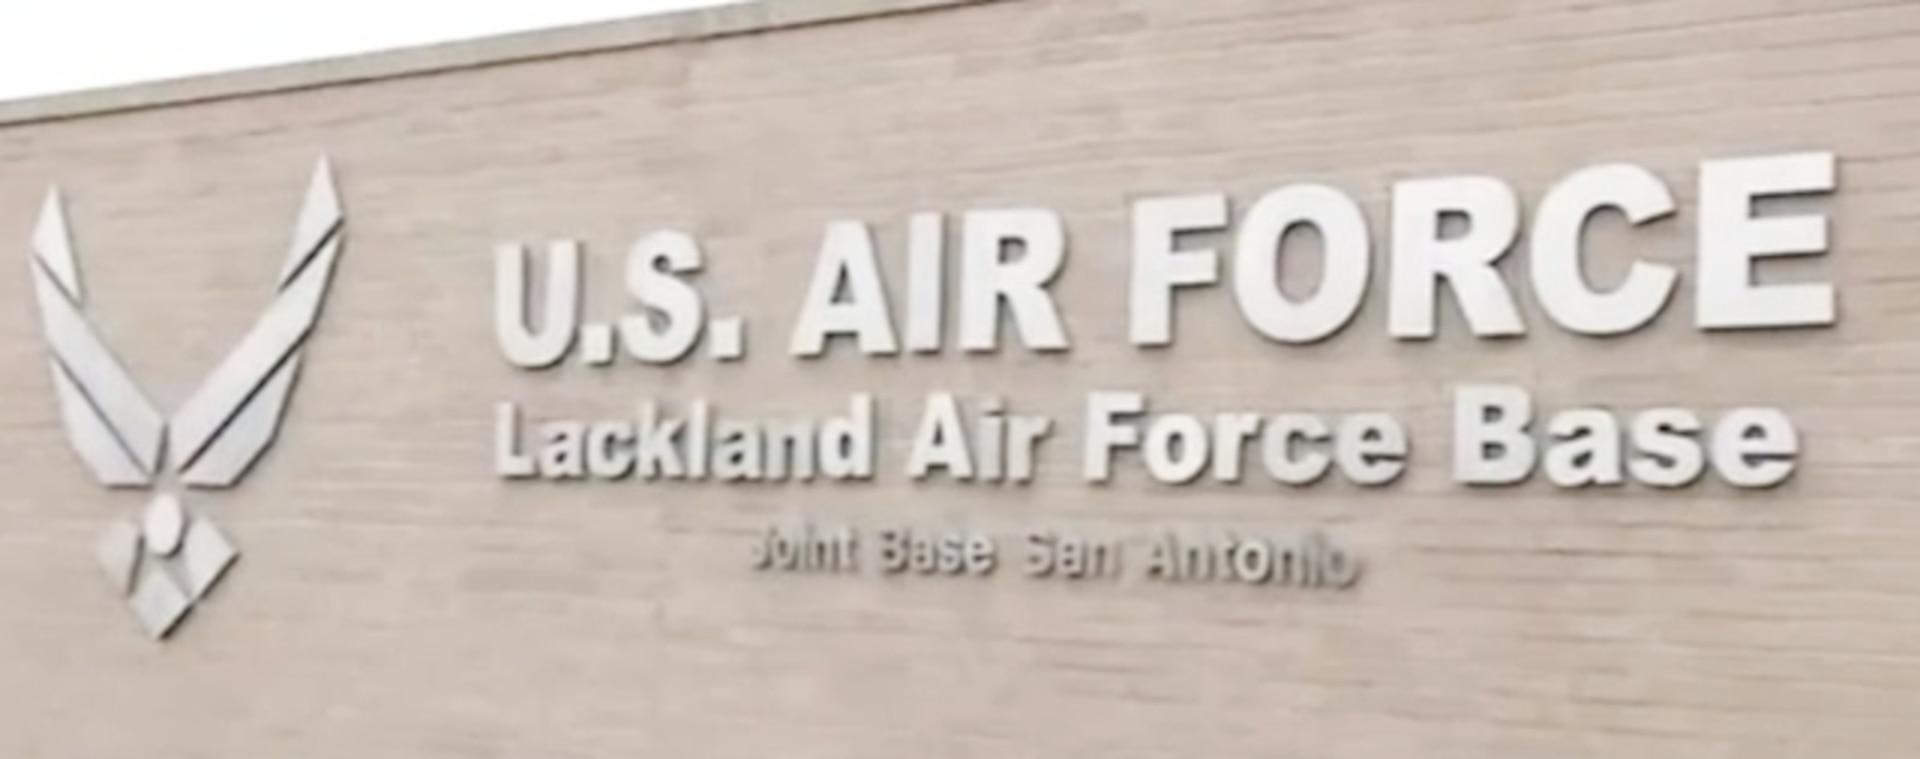 Lackland Air Force Base signage.